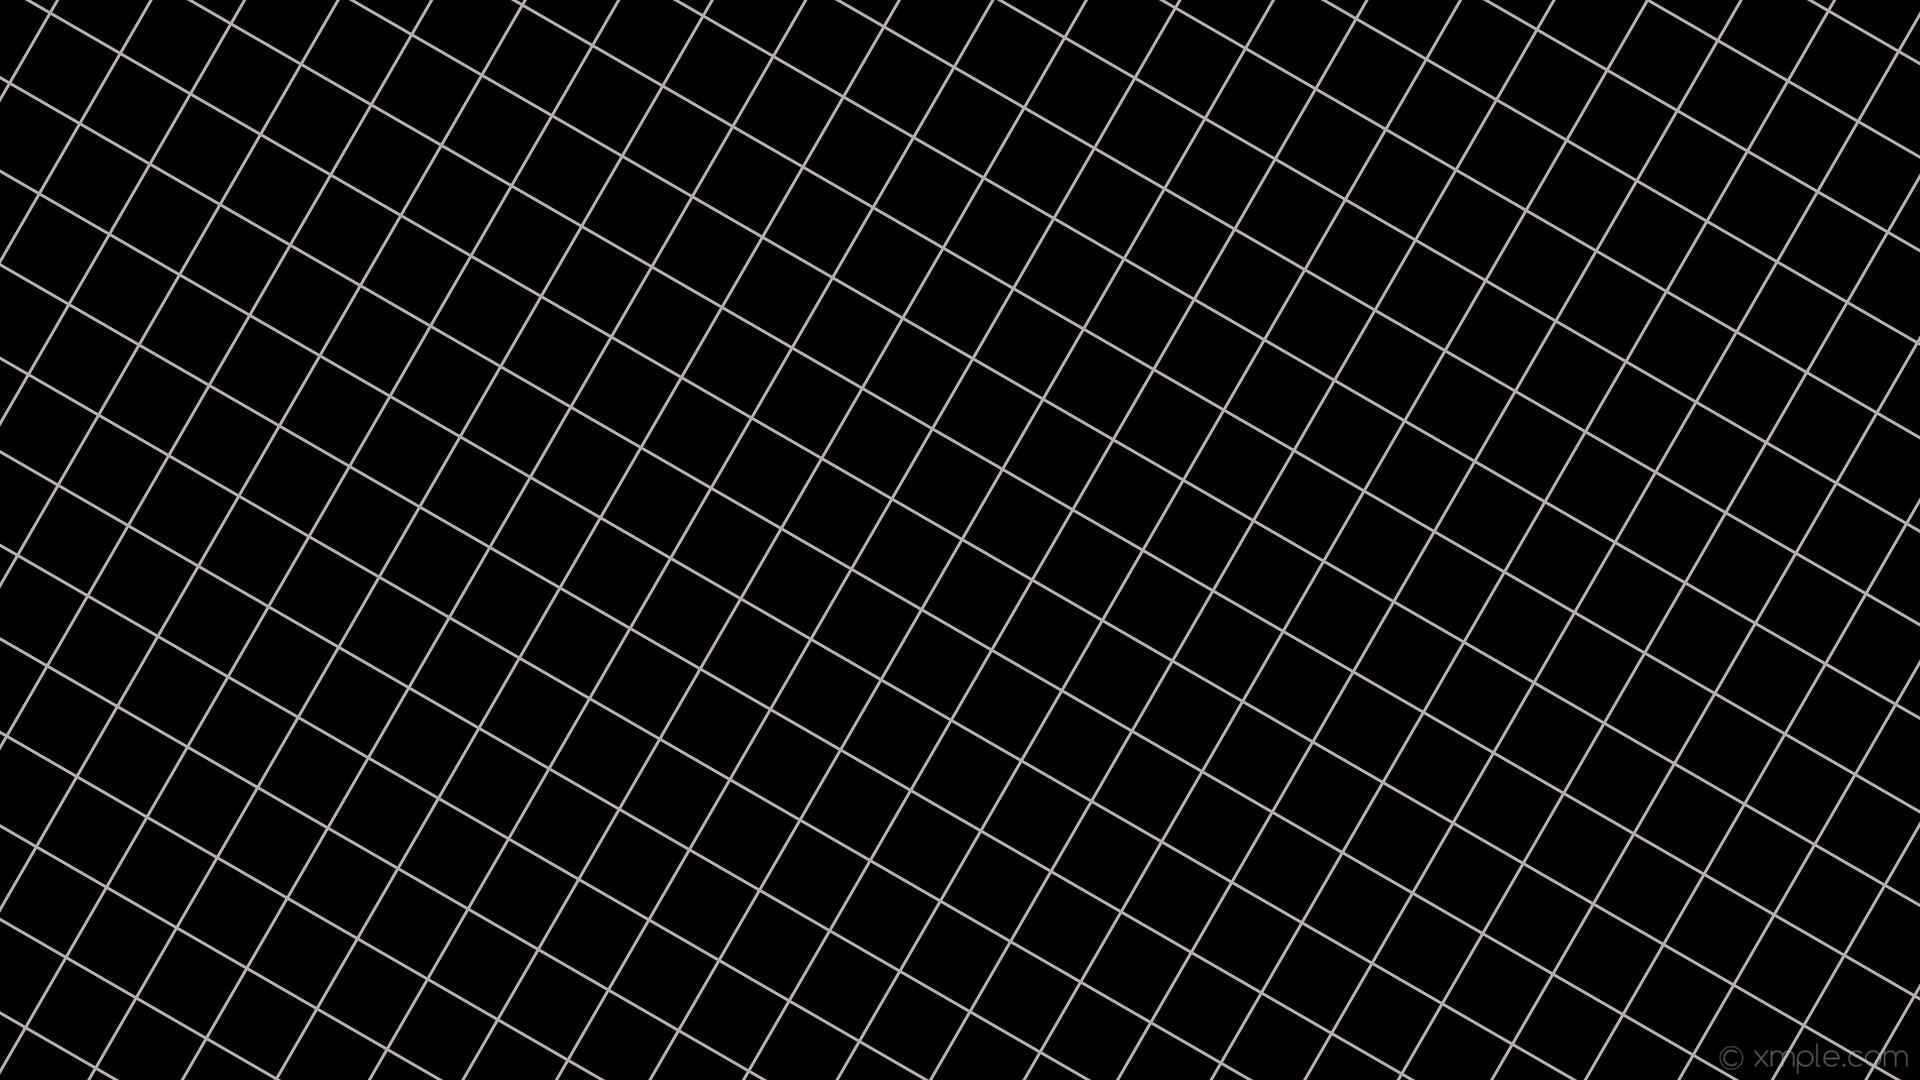 Dark Aesthetic 1920x1080 Wallpapers Wallpaper Cave